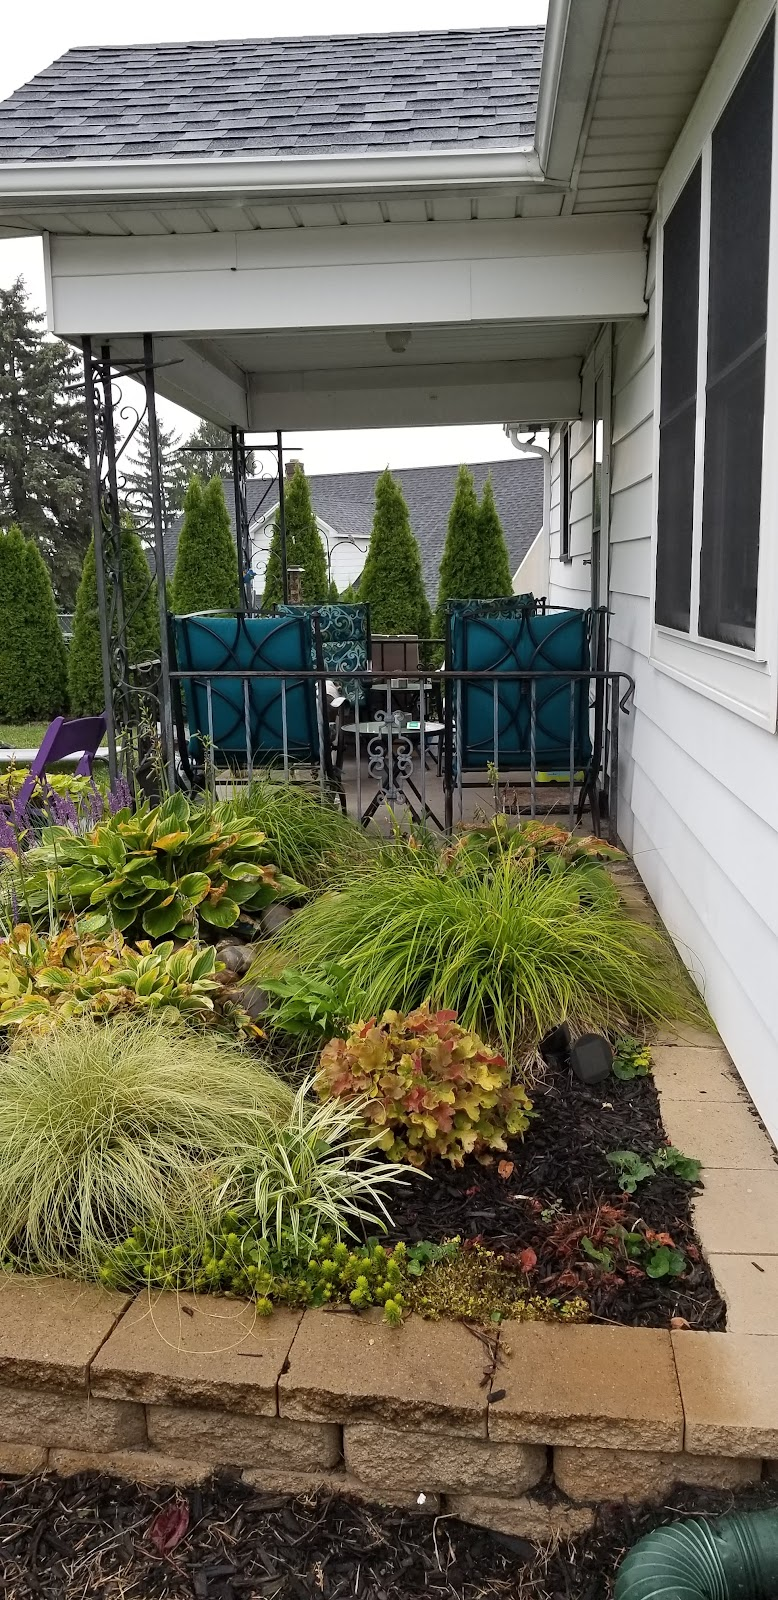 Sept 14 2019... Back porch view